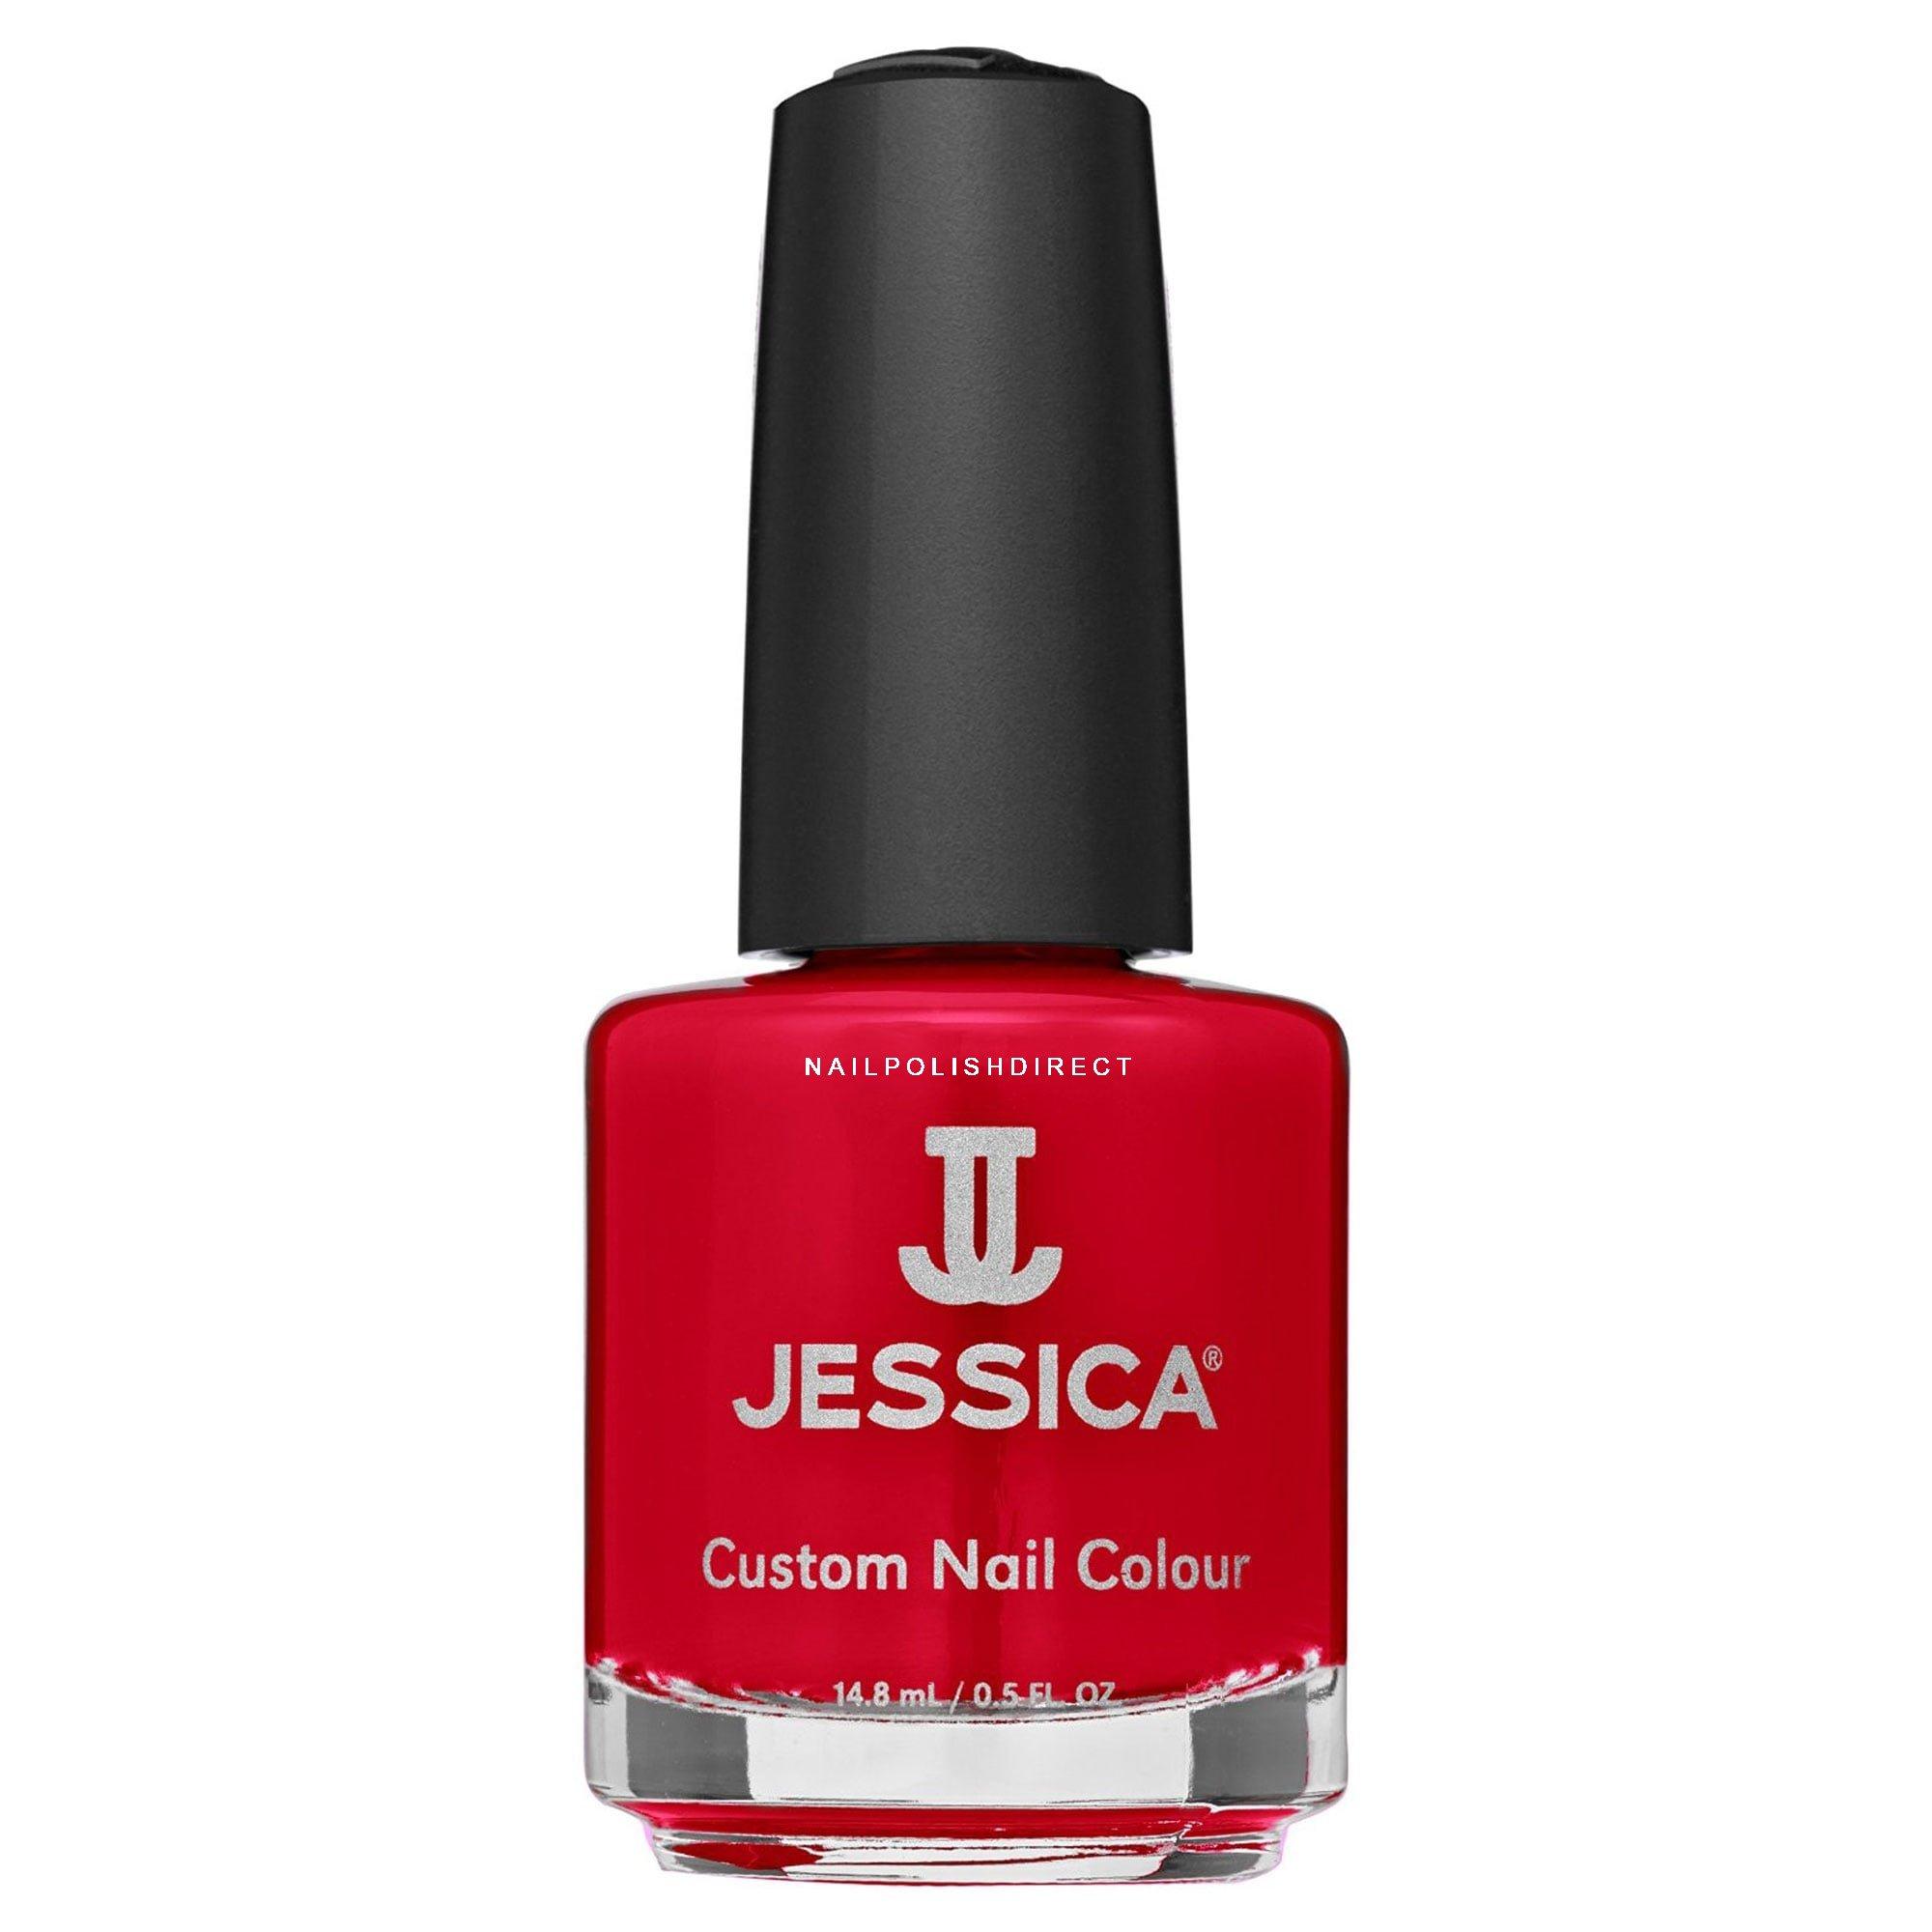 Jessica Orange Nail Polish: Jessica Nail Polish Collection Summer Neon Nails